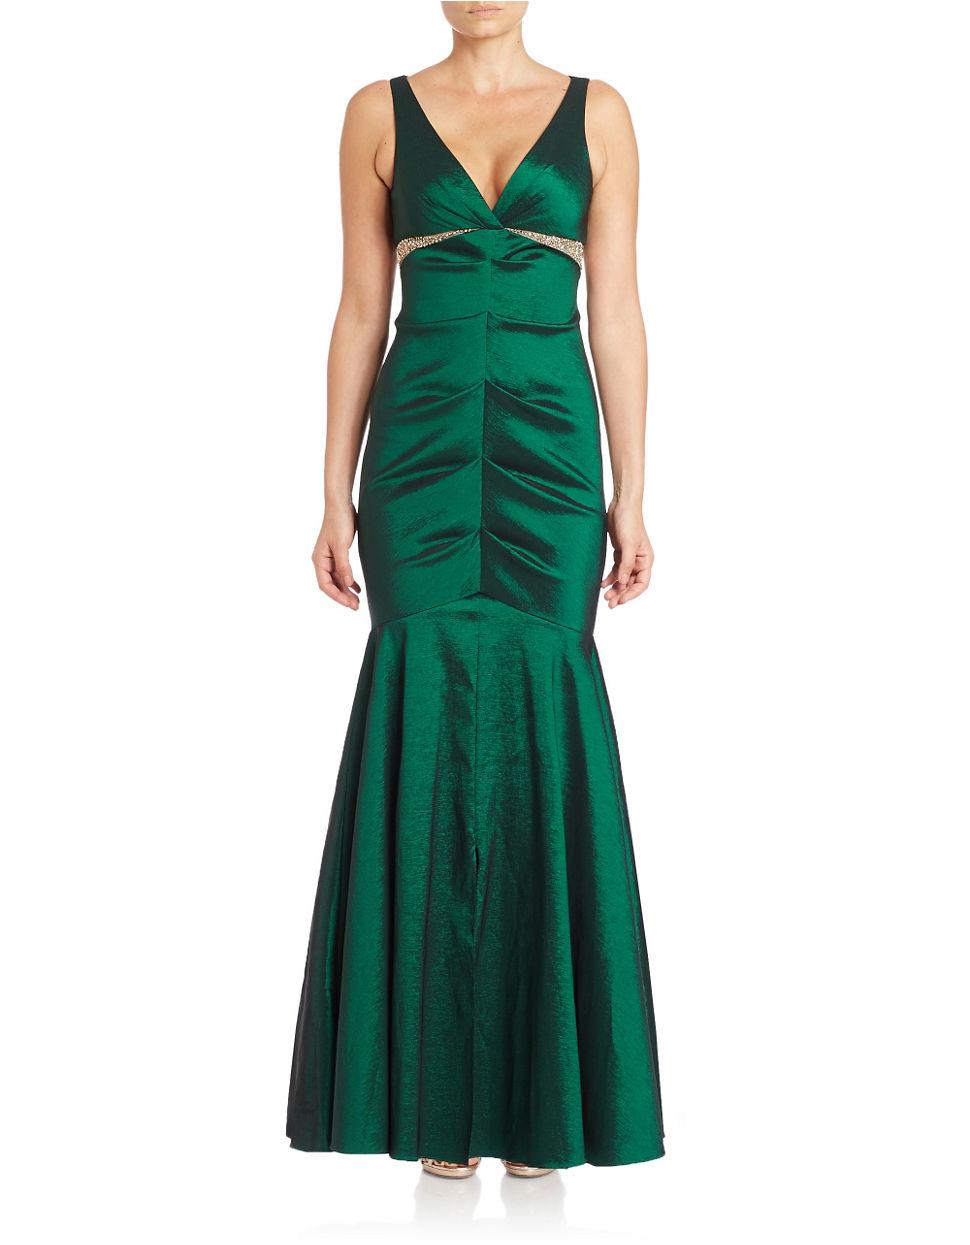 Xscape Dresses Green